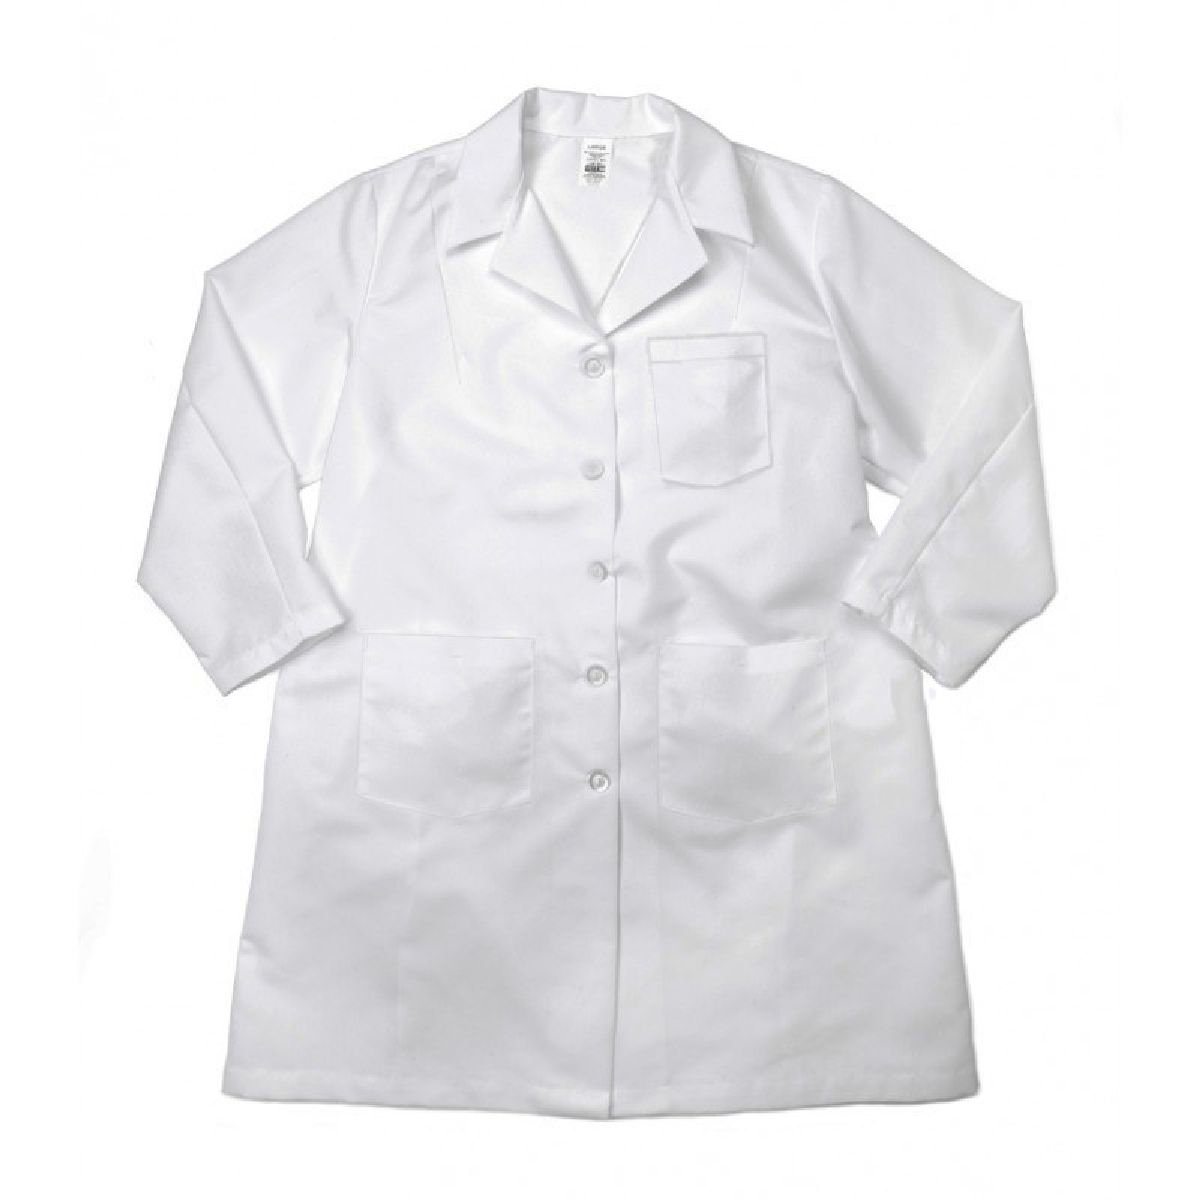 Pinnacle Textile L17M 5.25 OZ POPLIN 65//35 Polyester//Cotton BUTTONS-4X-Large-White Pinnacle Textiles L17M-4XL-WH Male LAB Coat